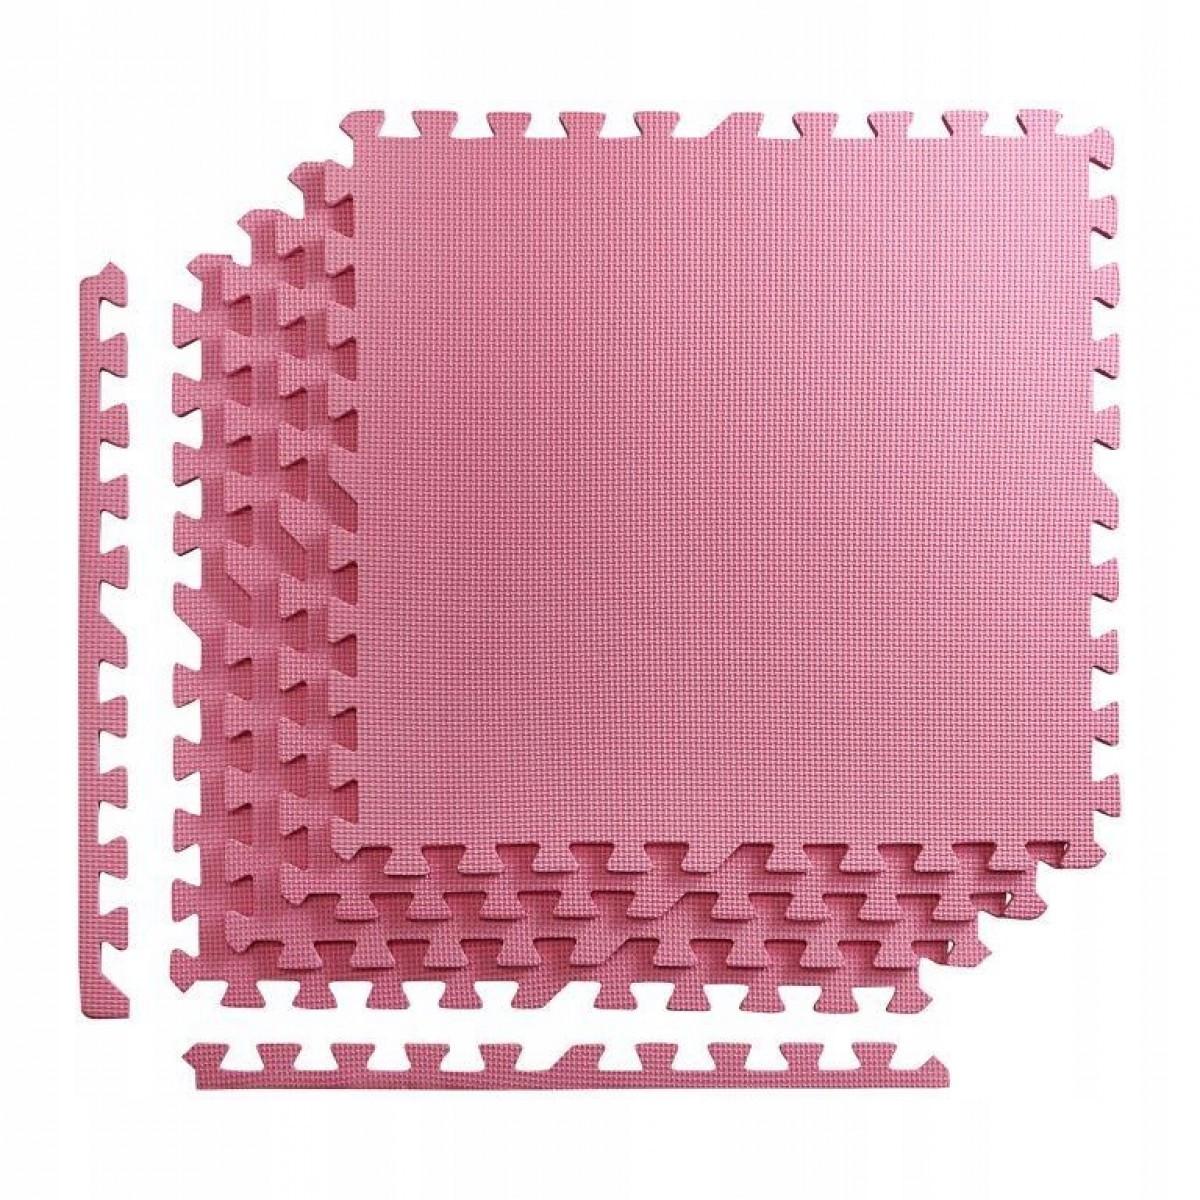 Мат пазл (ласточкин хвост) коврик татами 4FIZJO Mat Puzzle EVA 120 x 120 x 1 cм 4FJ0079 Pink